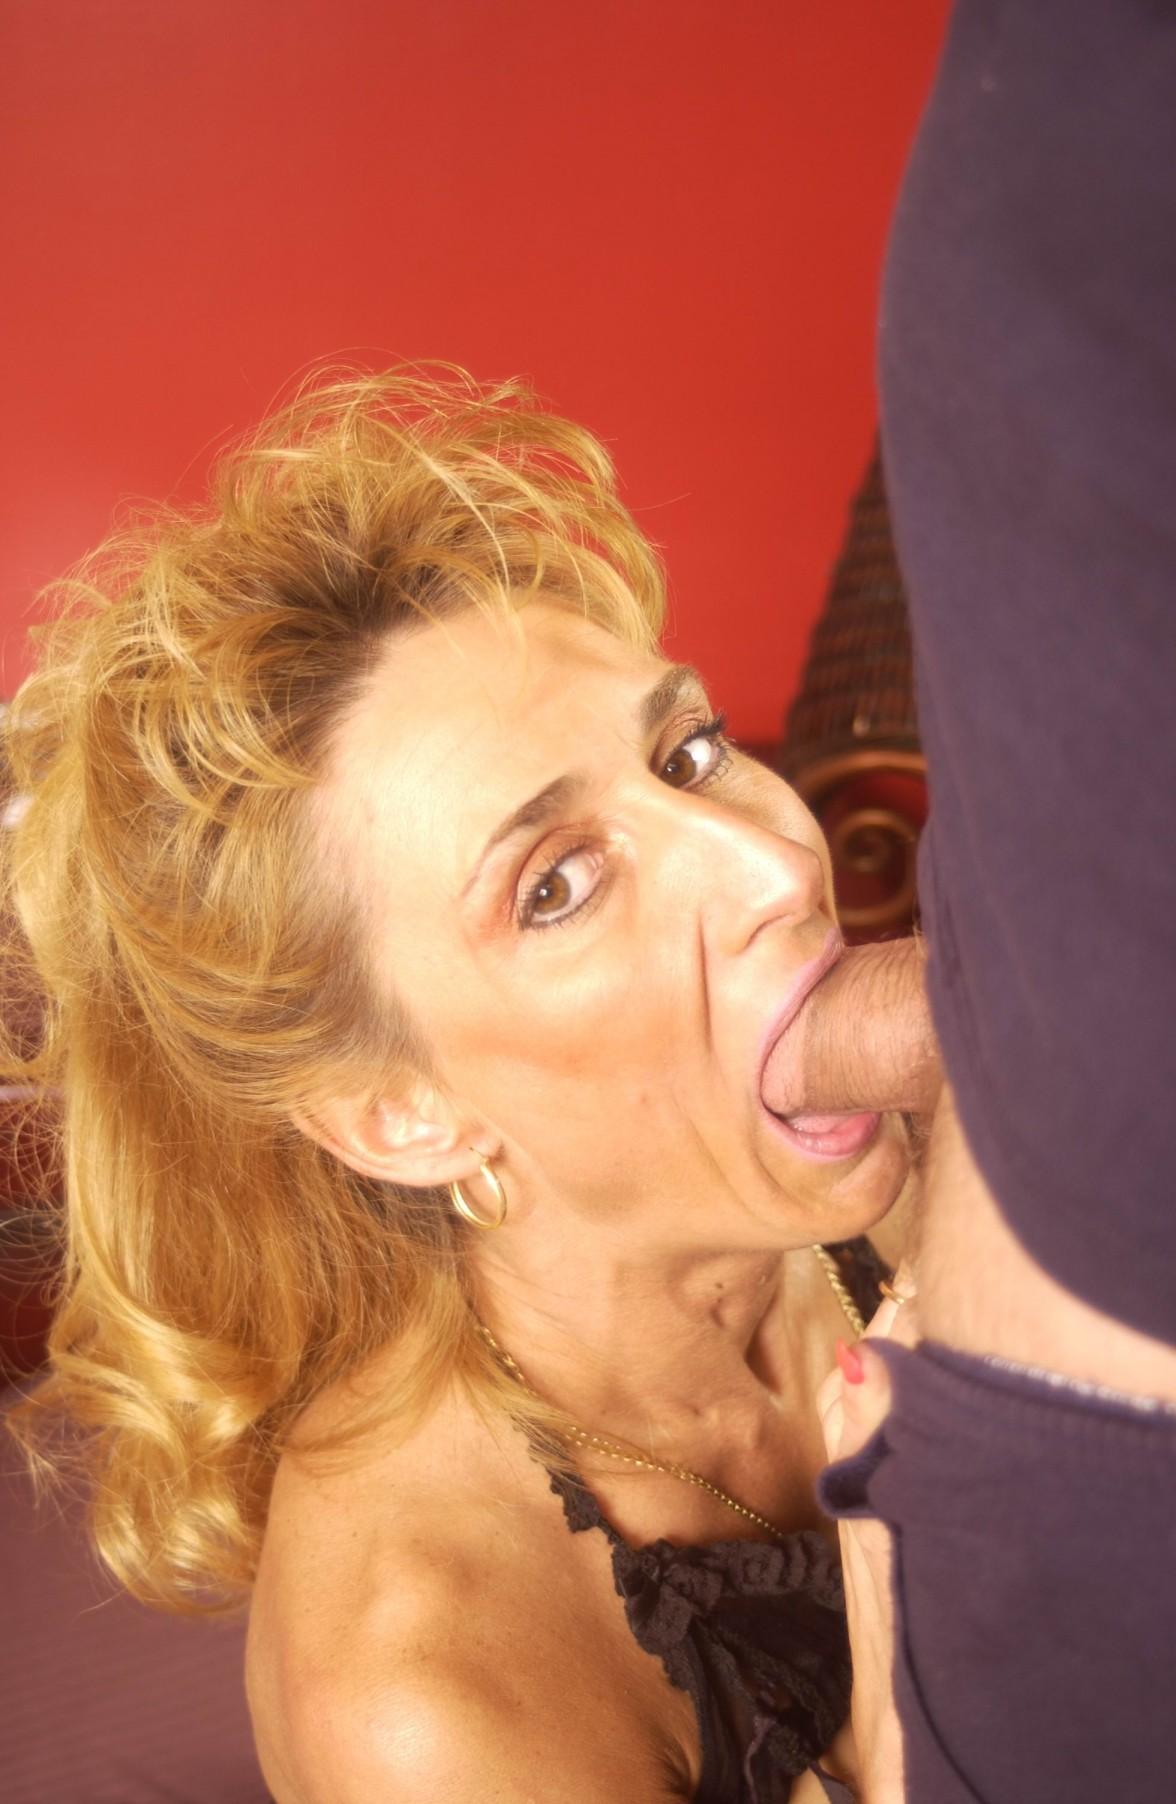 Femme lesbienne chaude-2123